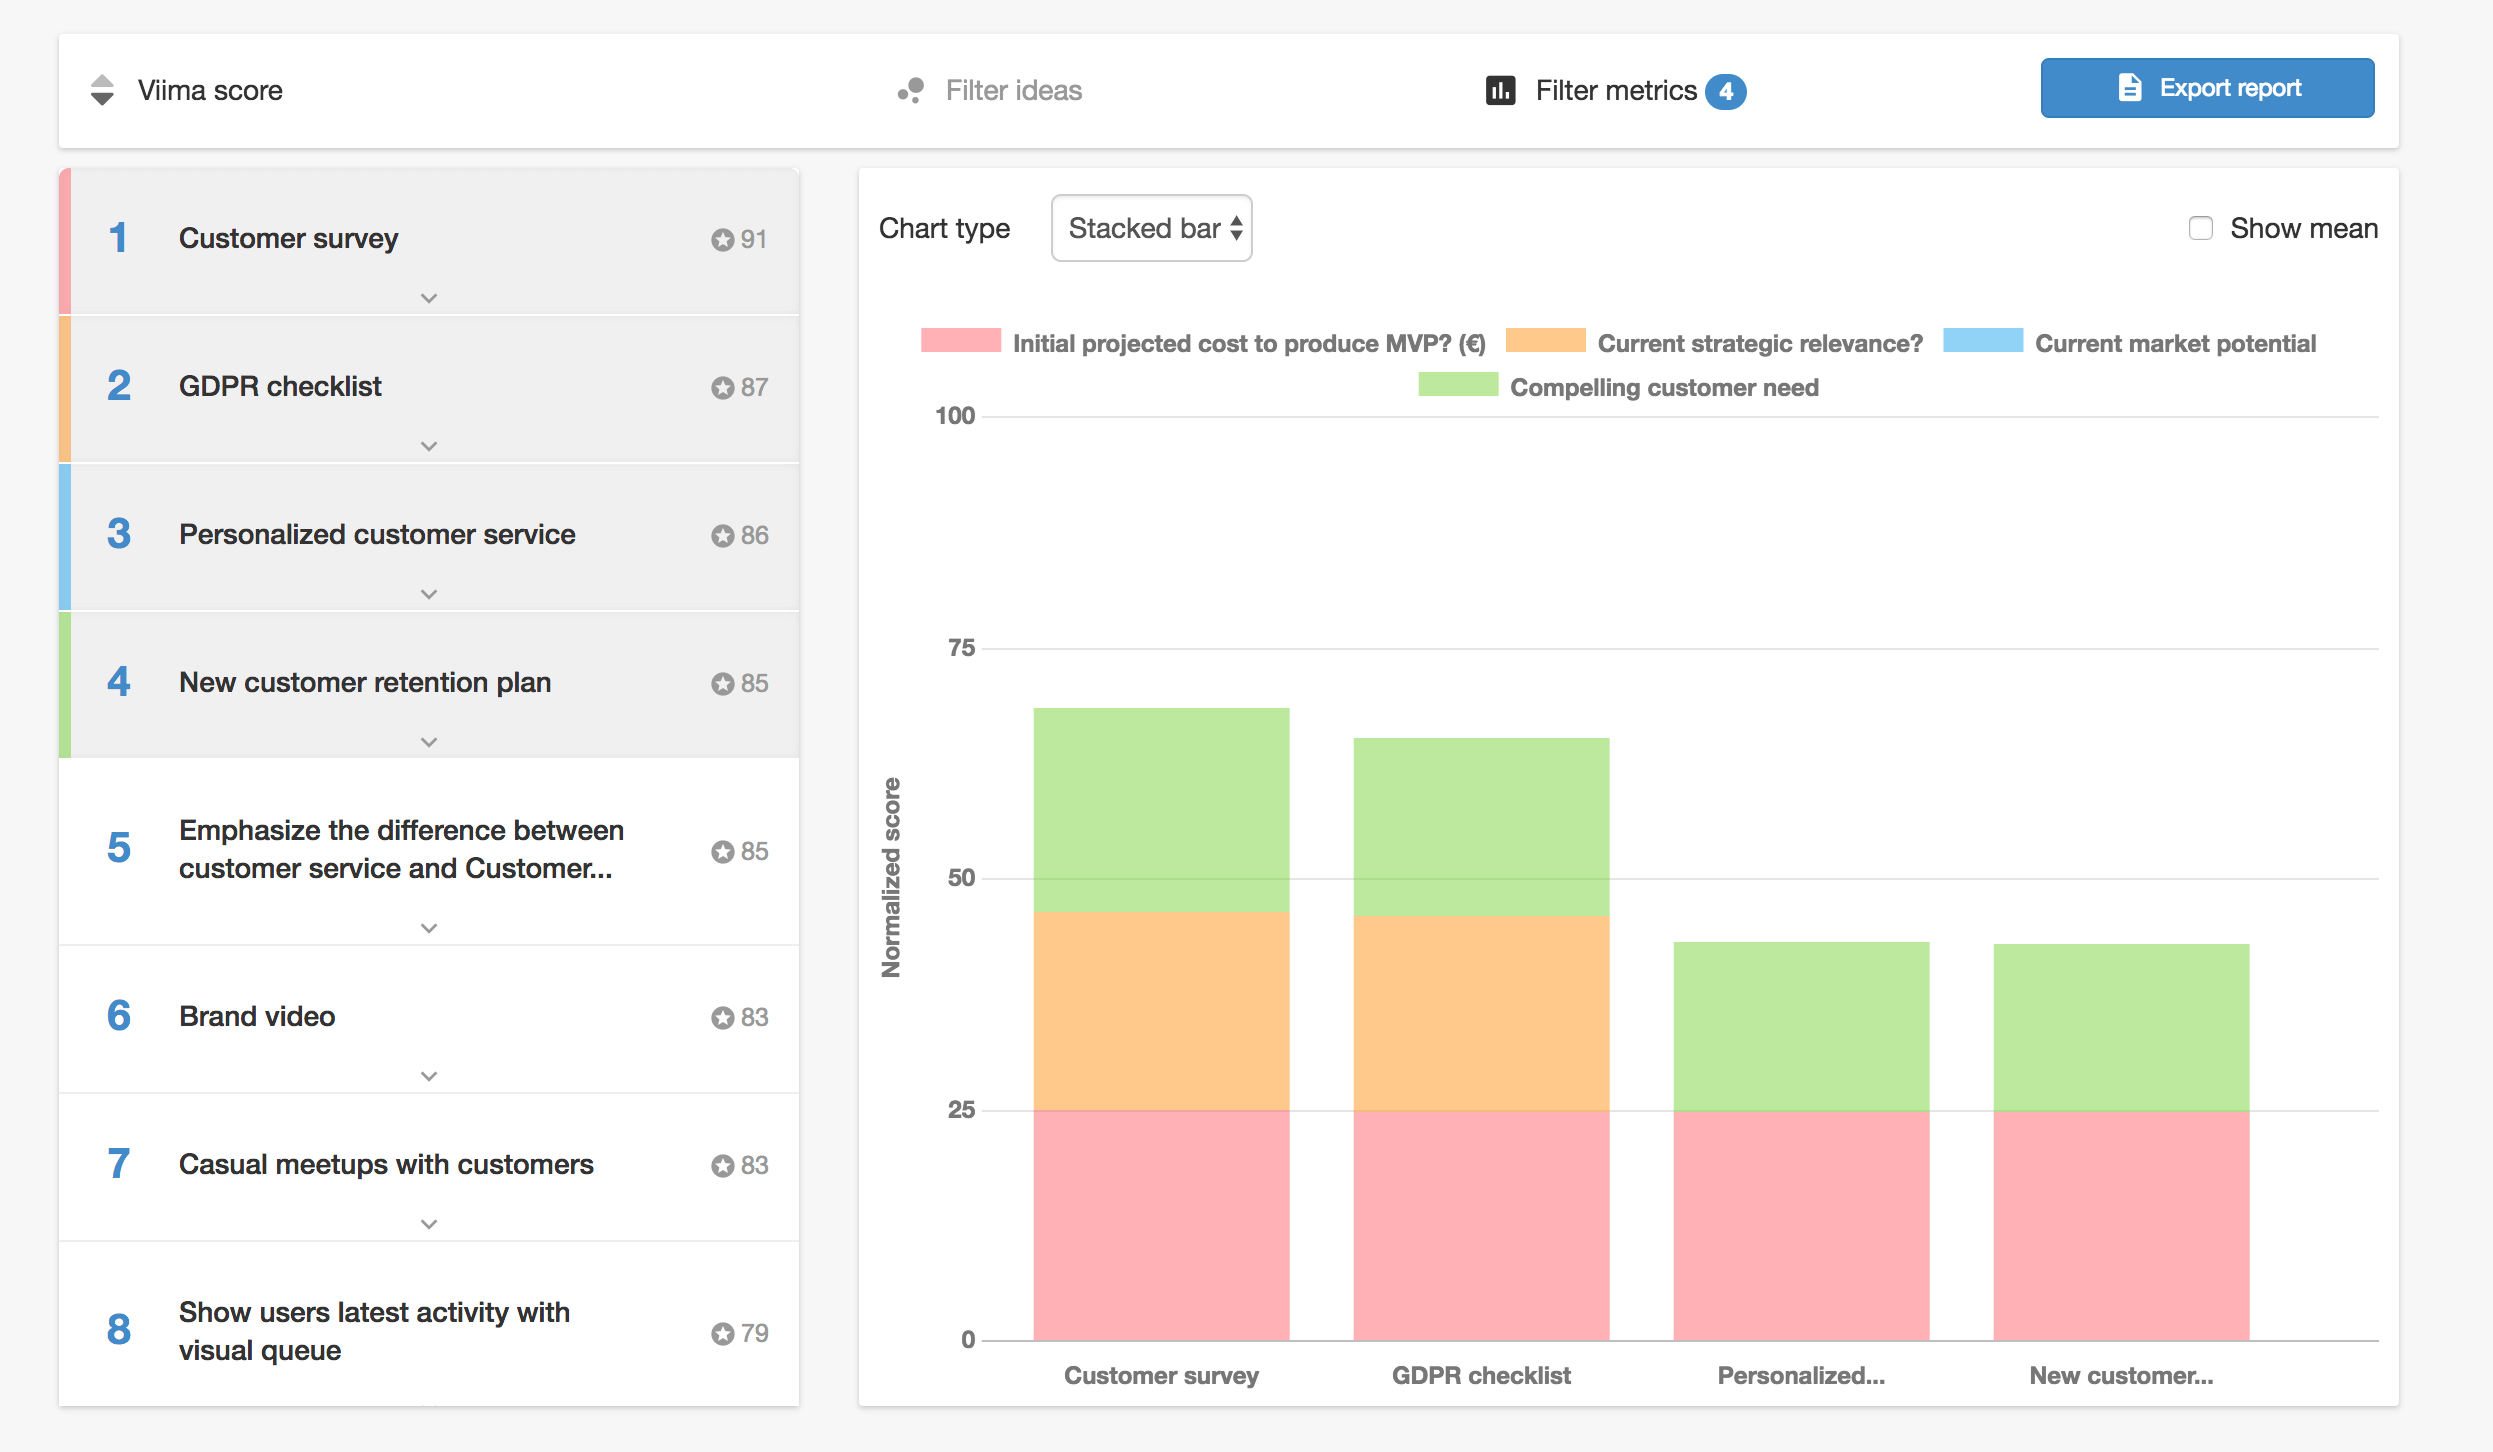 Viima-evaluation-dashboard-2018-10-18